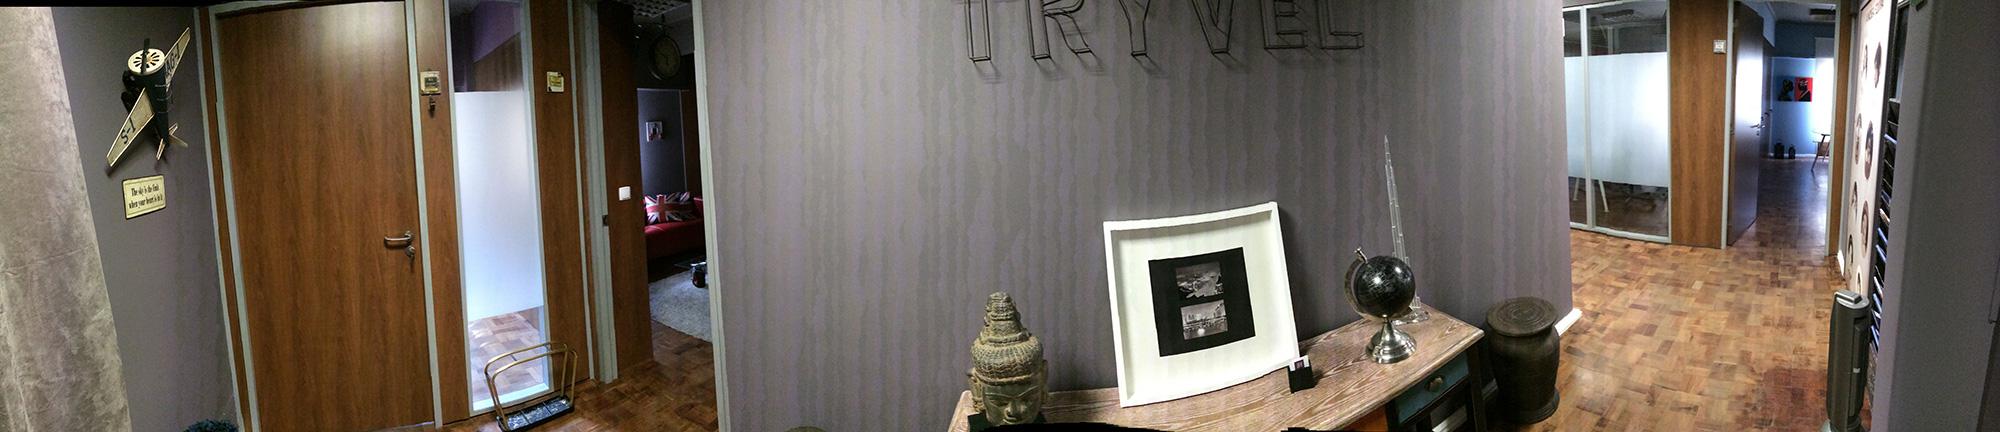 Tryvel Office -  Lobby